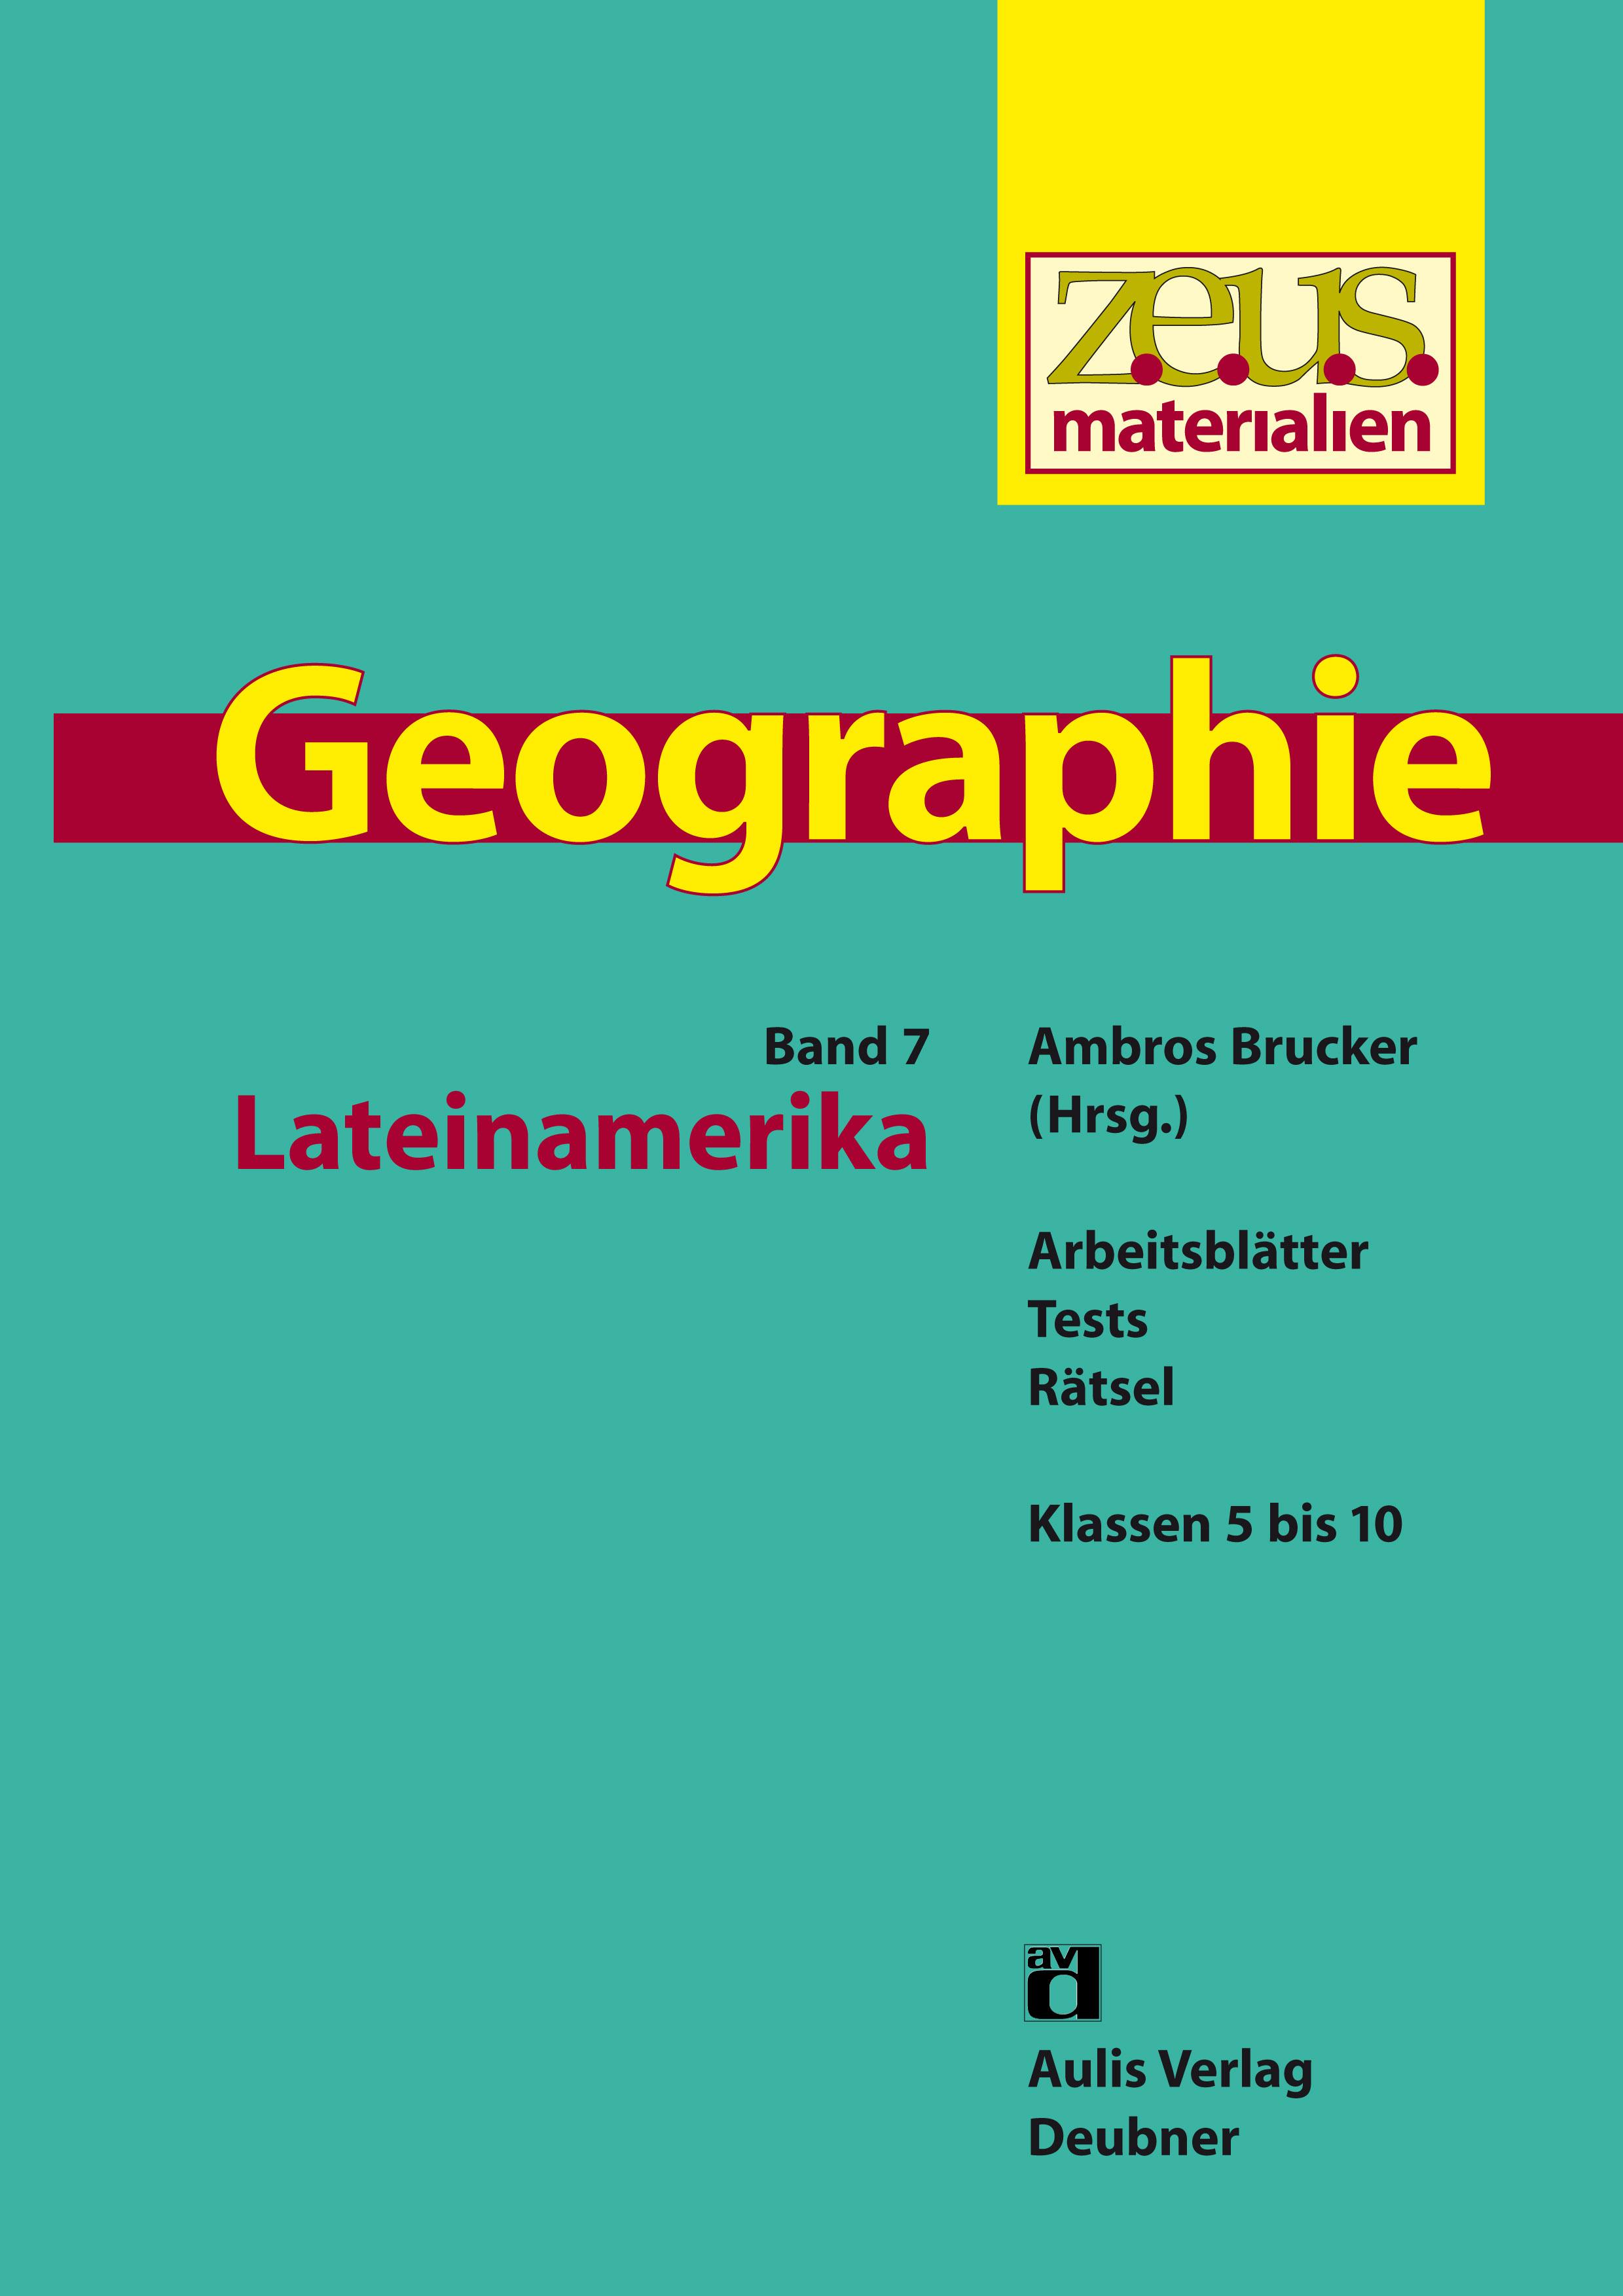 z.e.u.s. Materialien Geographie-Buchreihe – Band 7: Lateinamerika